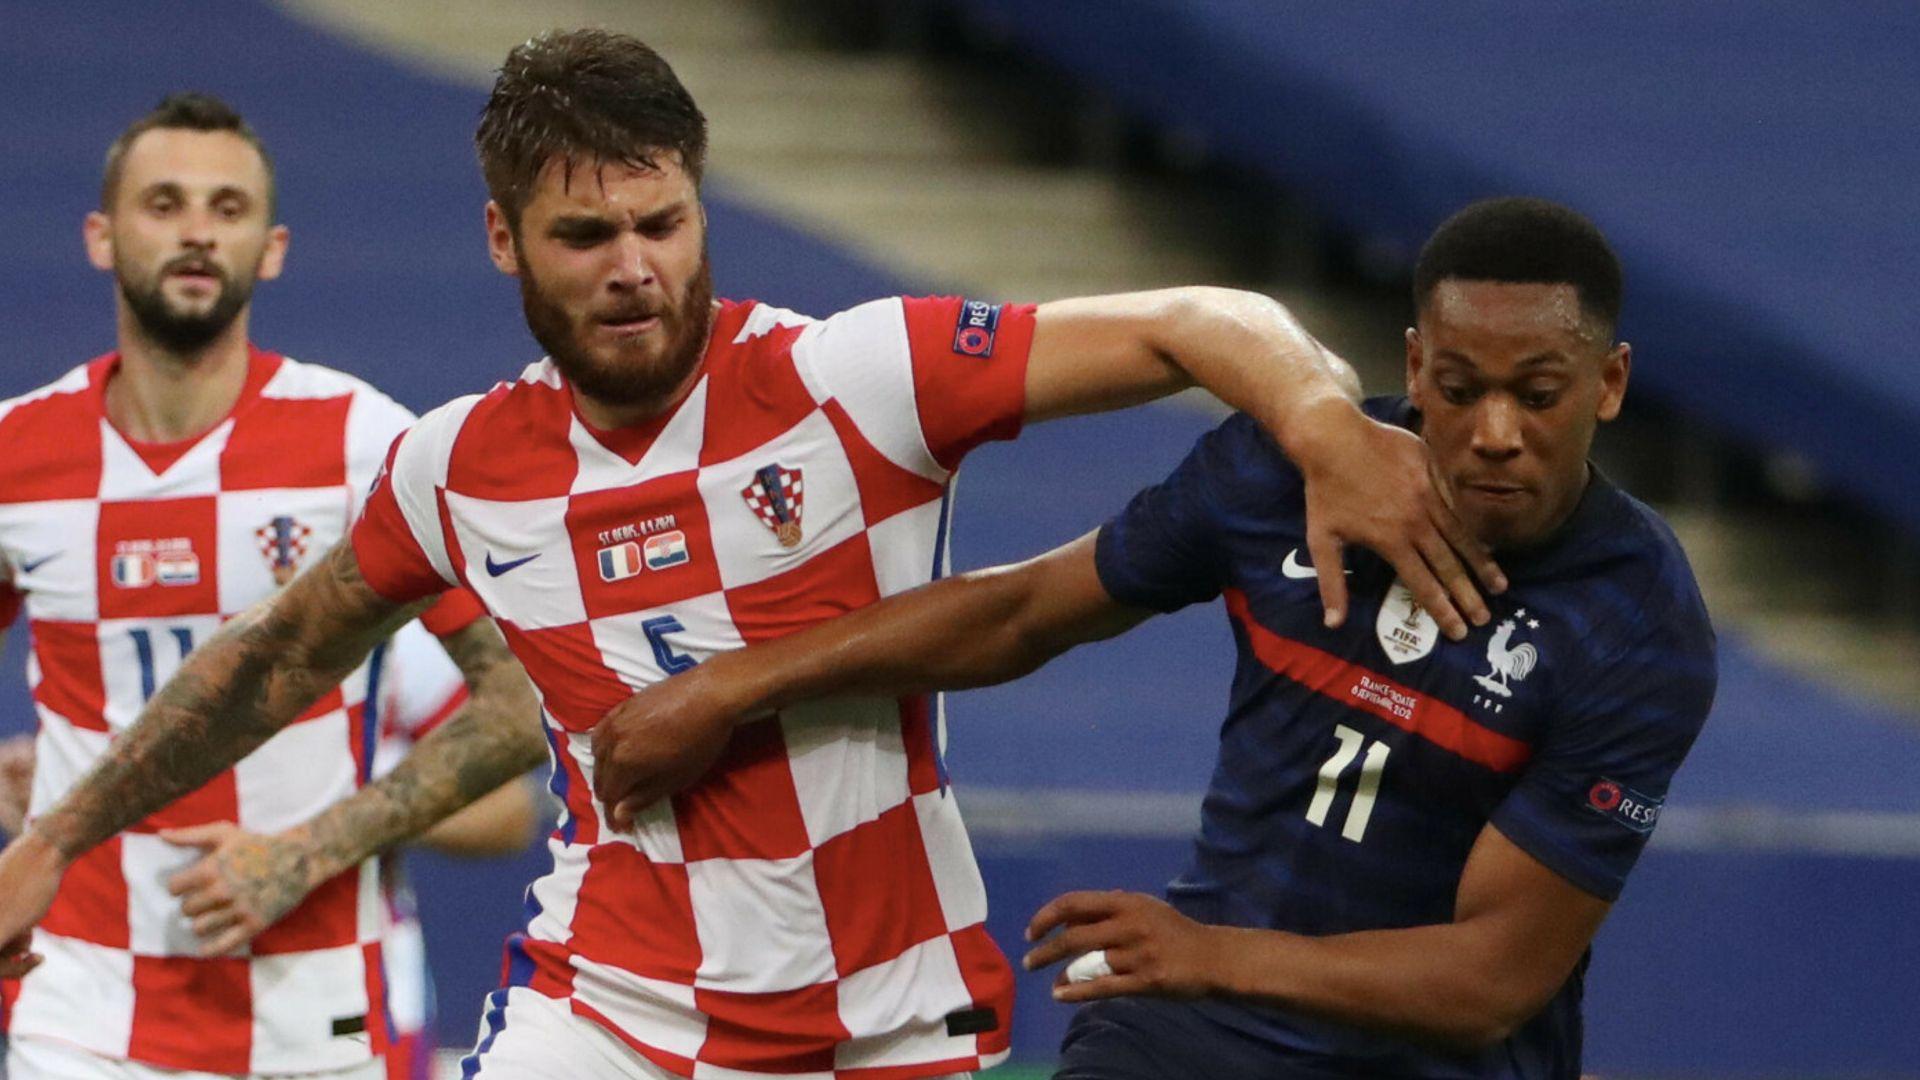 Nations League on Sky: Can Croatia avenge World Cup final defeat?